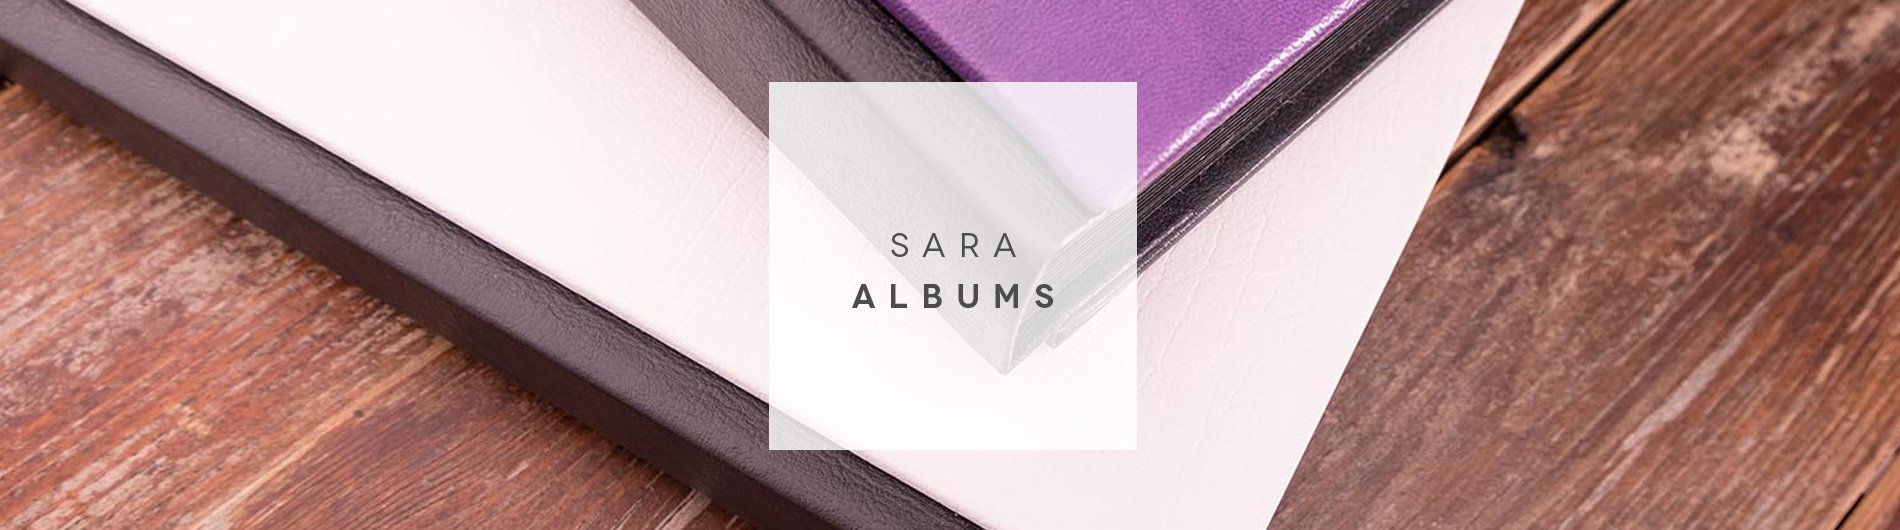 sara photo albums